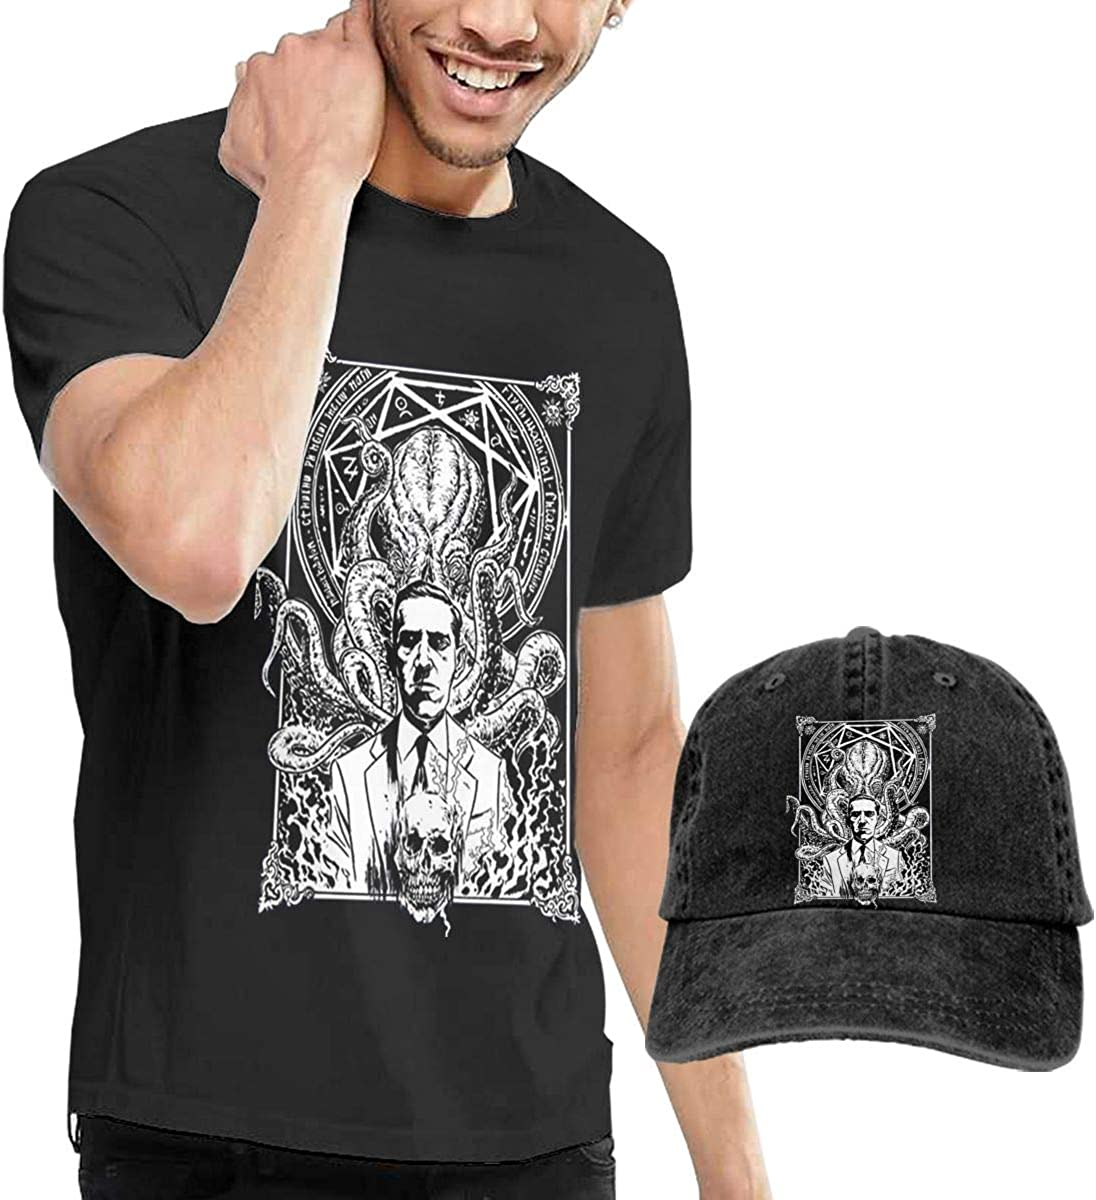 Hp Lovecraft Fashion T Shirt+Cowboy Hat for Men's Black